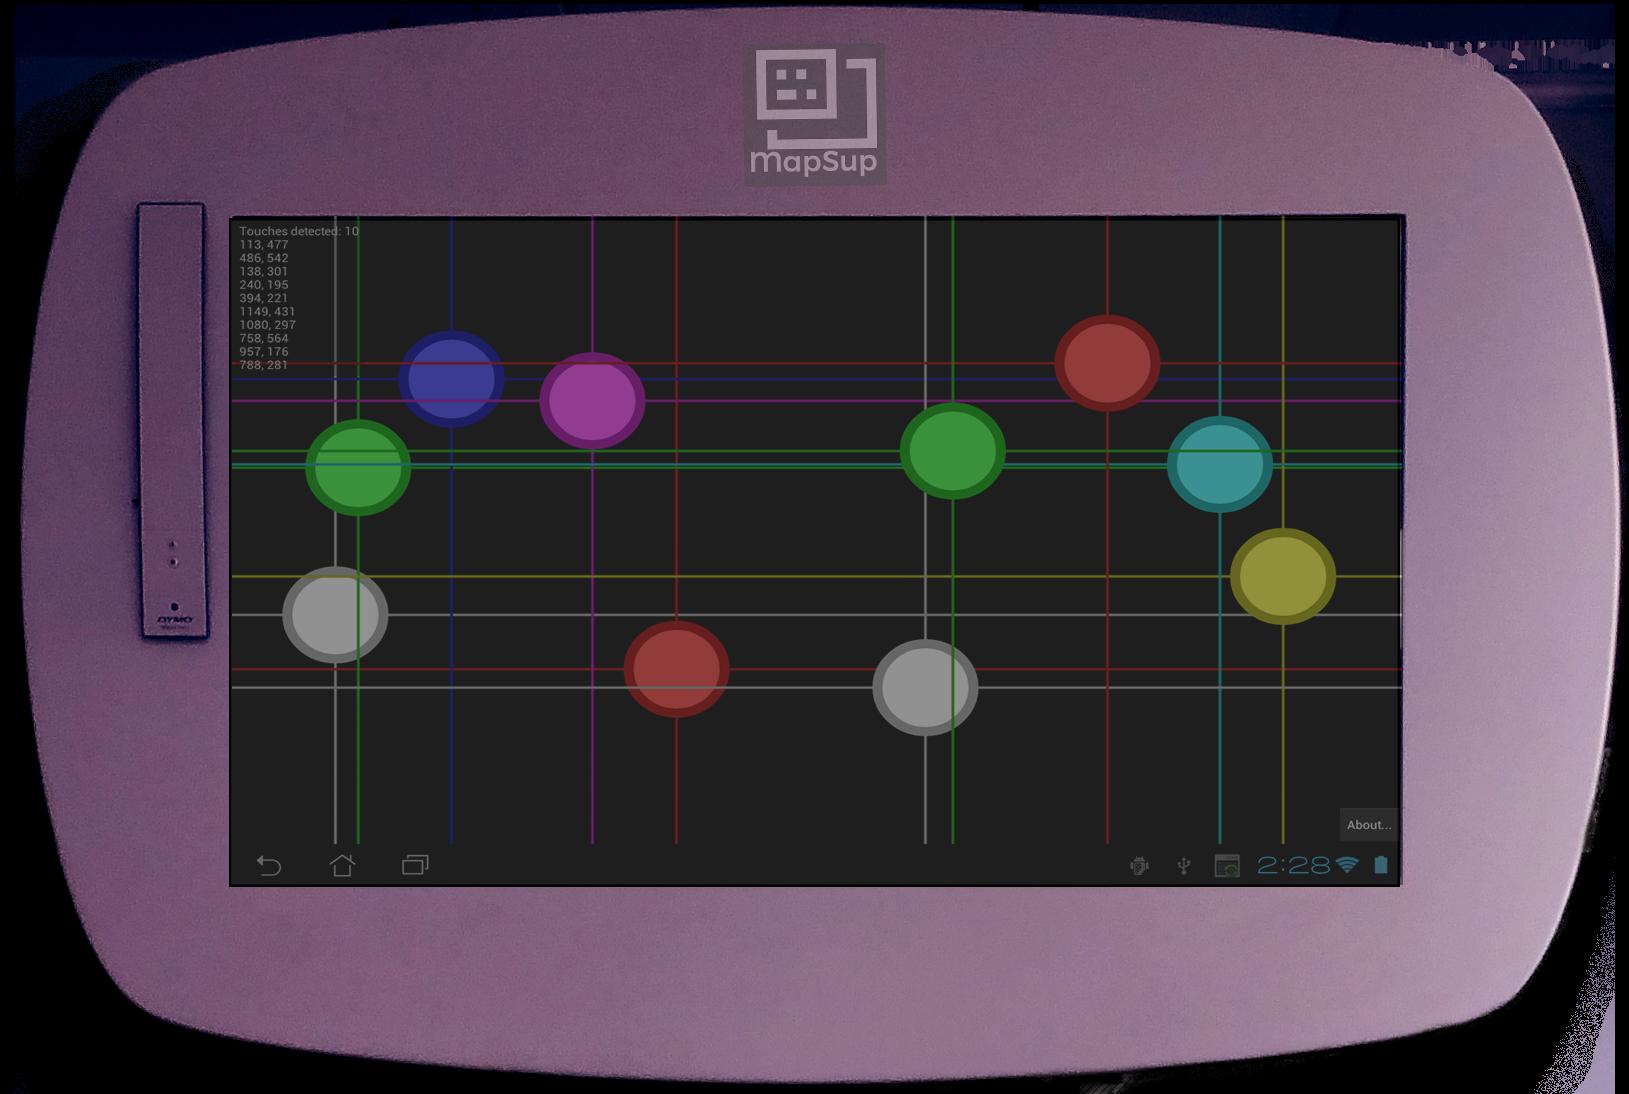 mapsup_maptable_purple.png